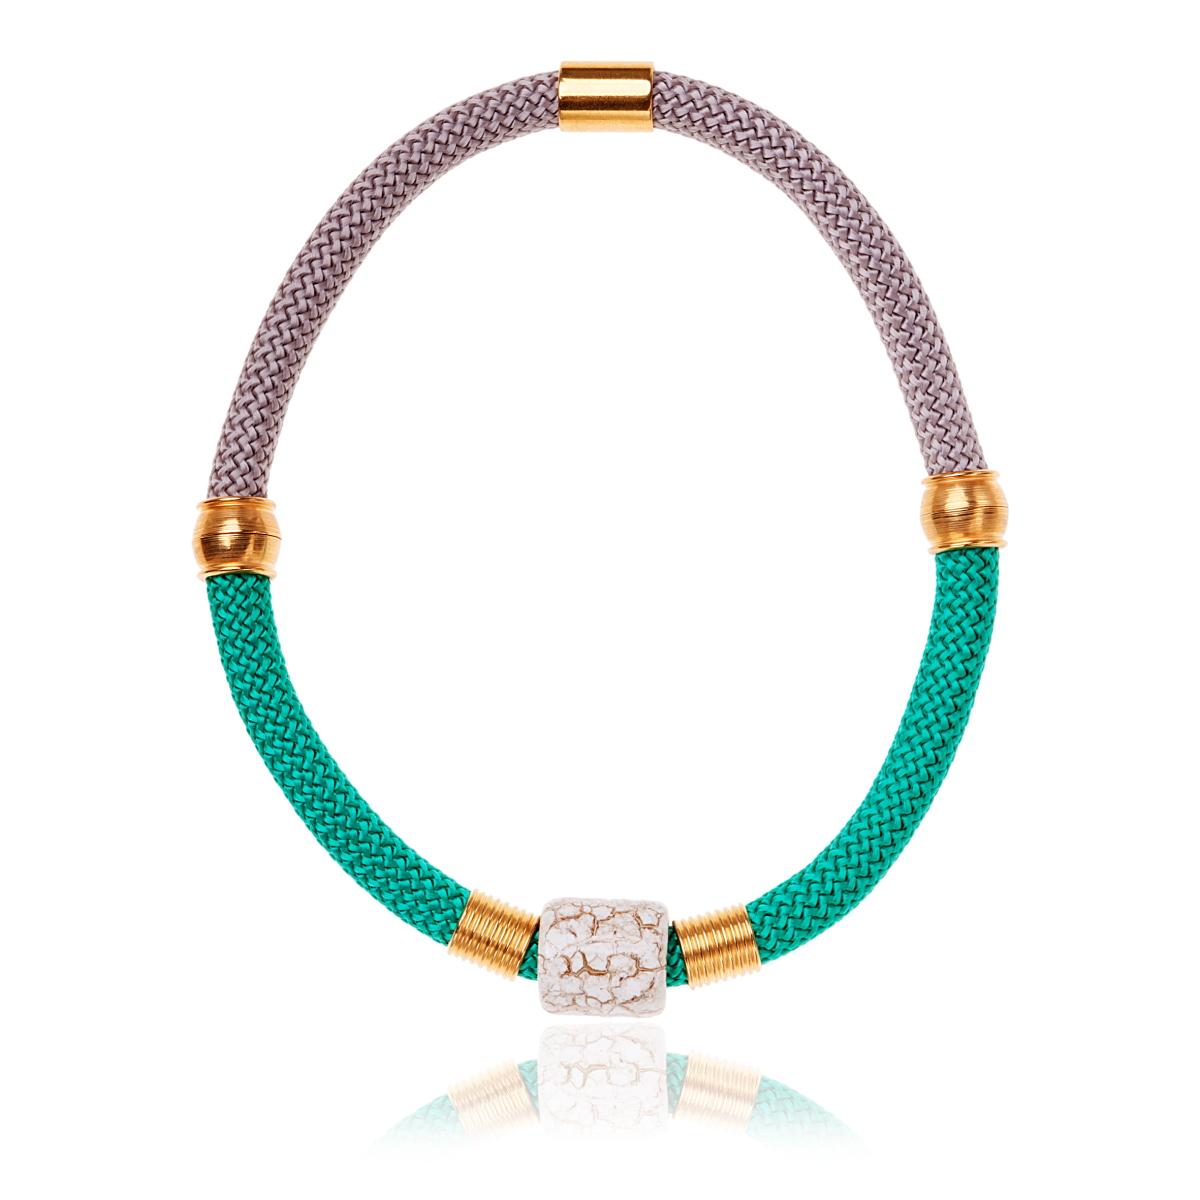 IRIS: Make a statement bracelet / Grey & Gold | Accessories,Jewelry > Bracelets,Jewelry -  Hiphunters Shop